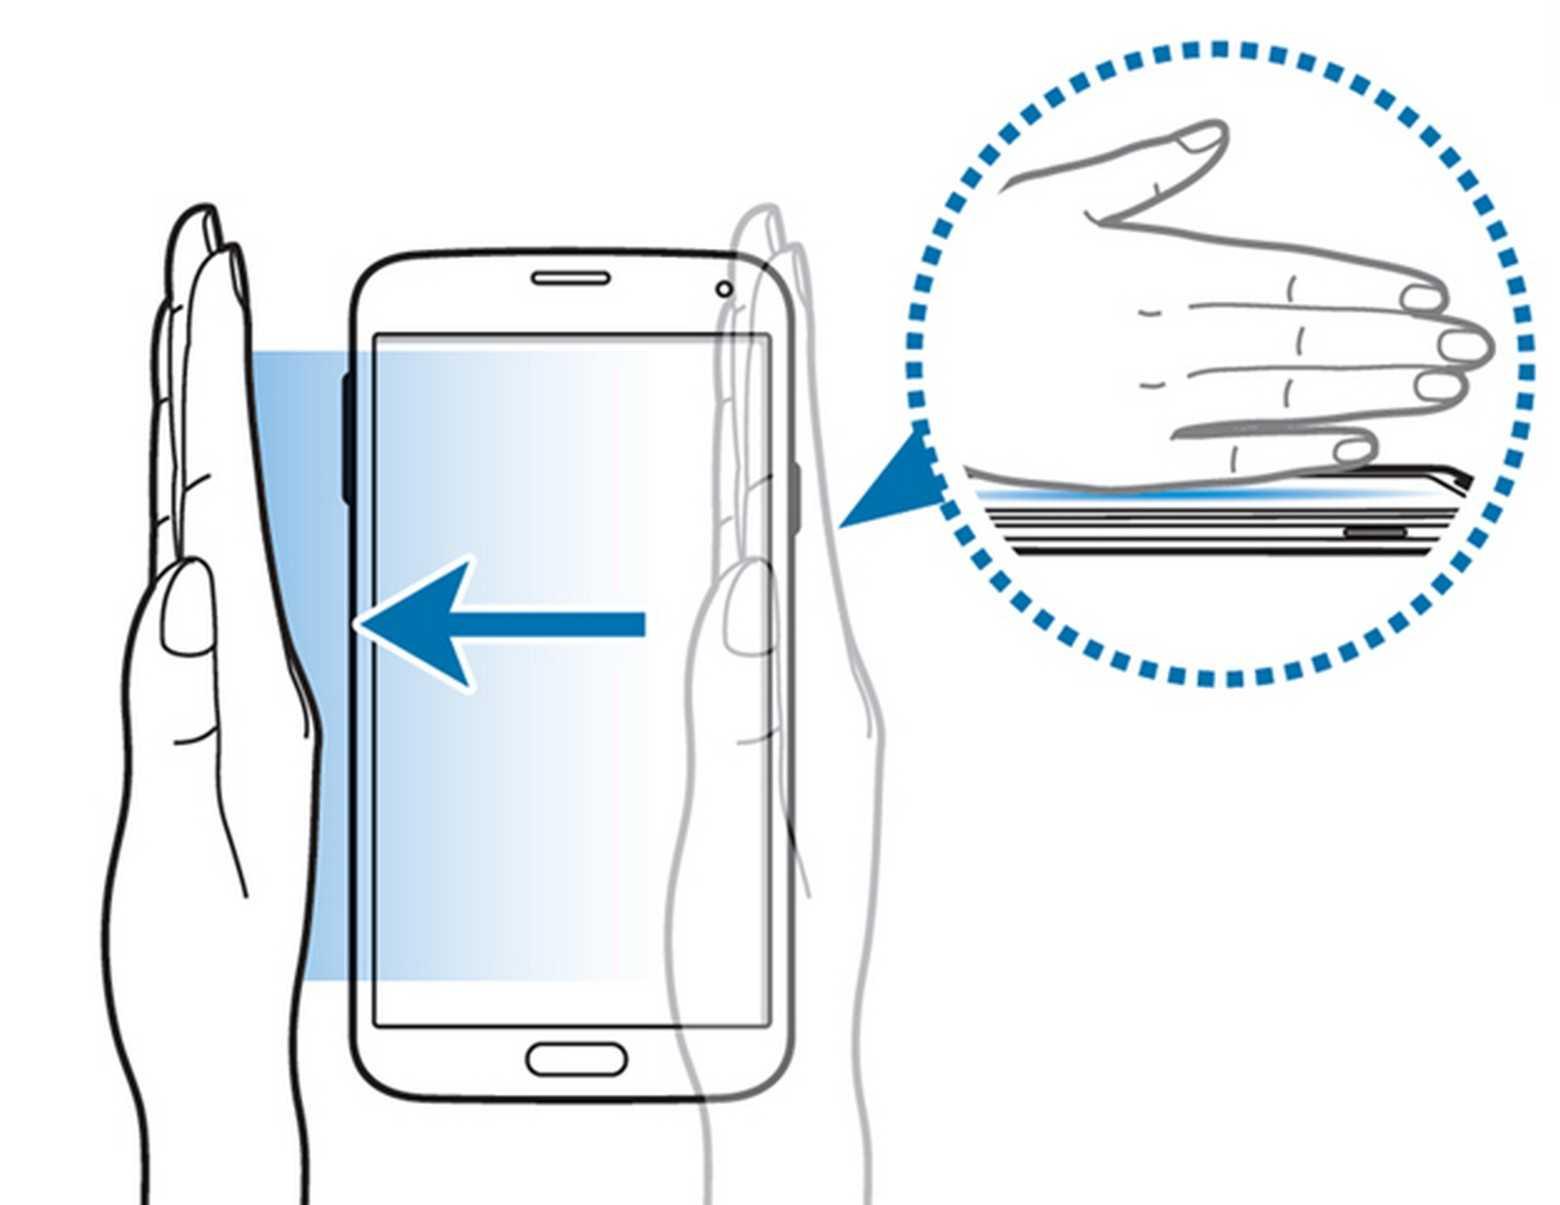 How to take a screenshot on the phone